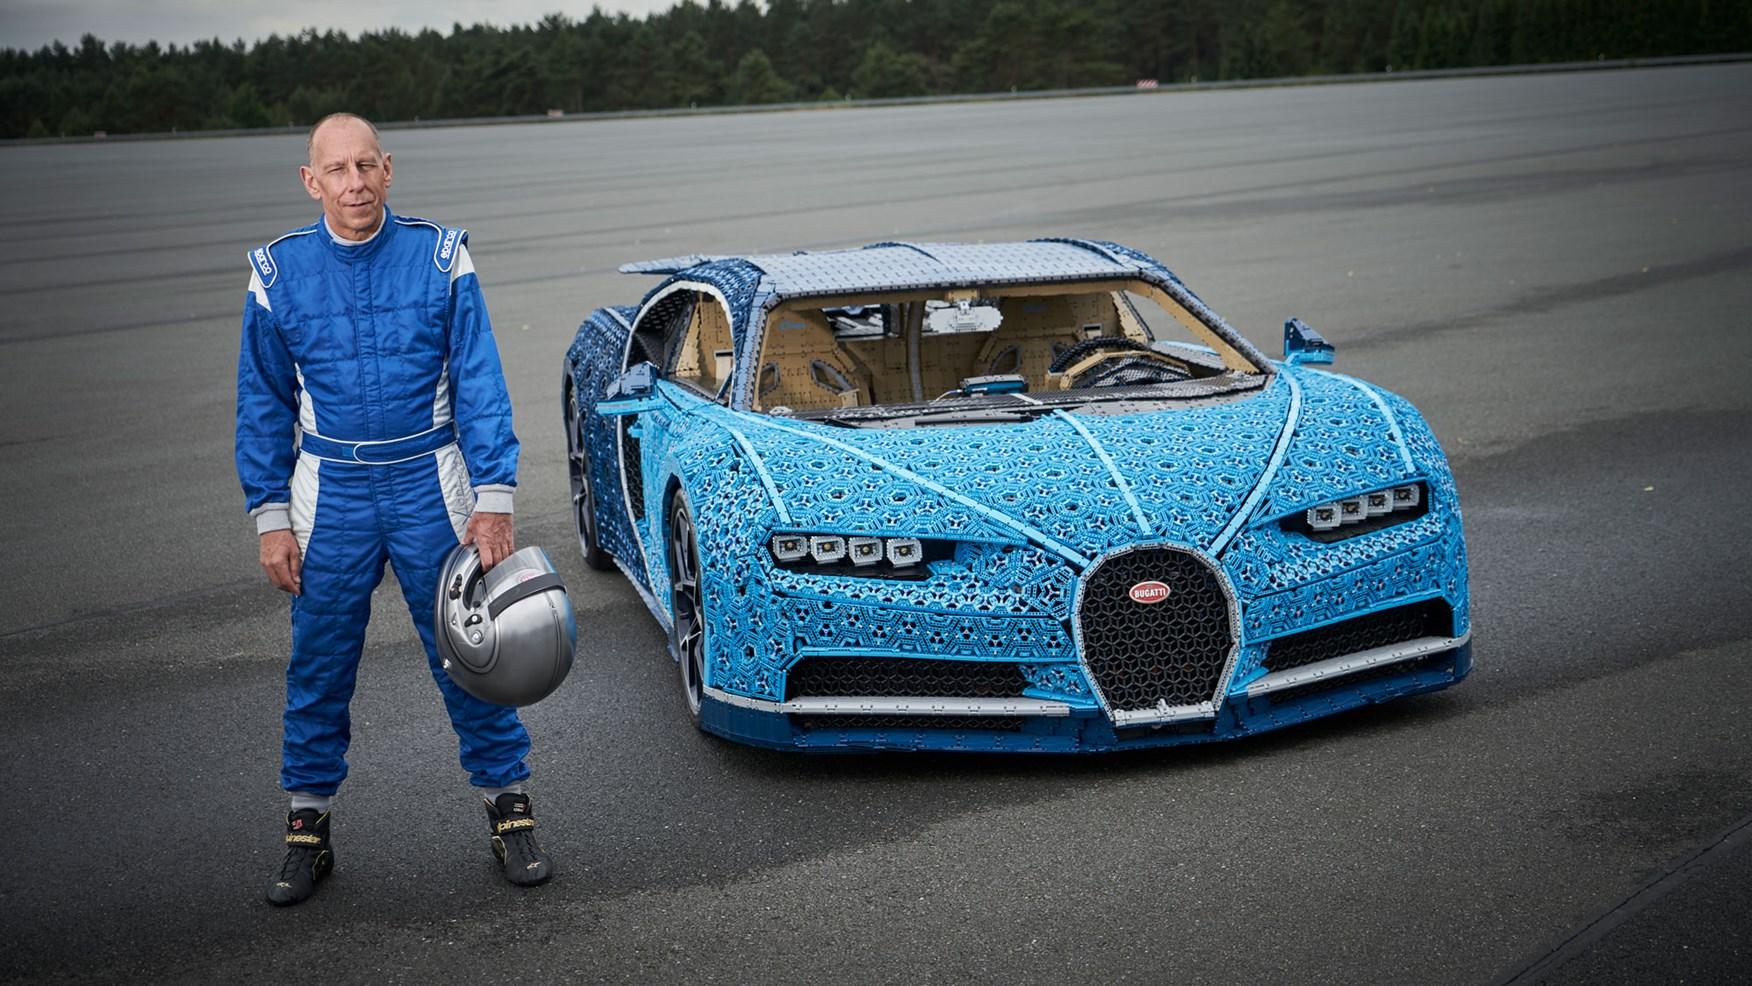 Lego built a life-size Bugatti Chiron you can drive   CAR Magazine